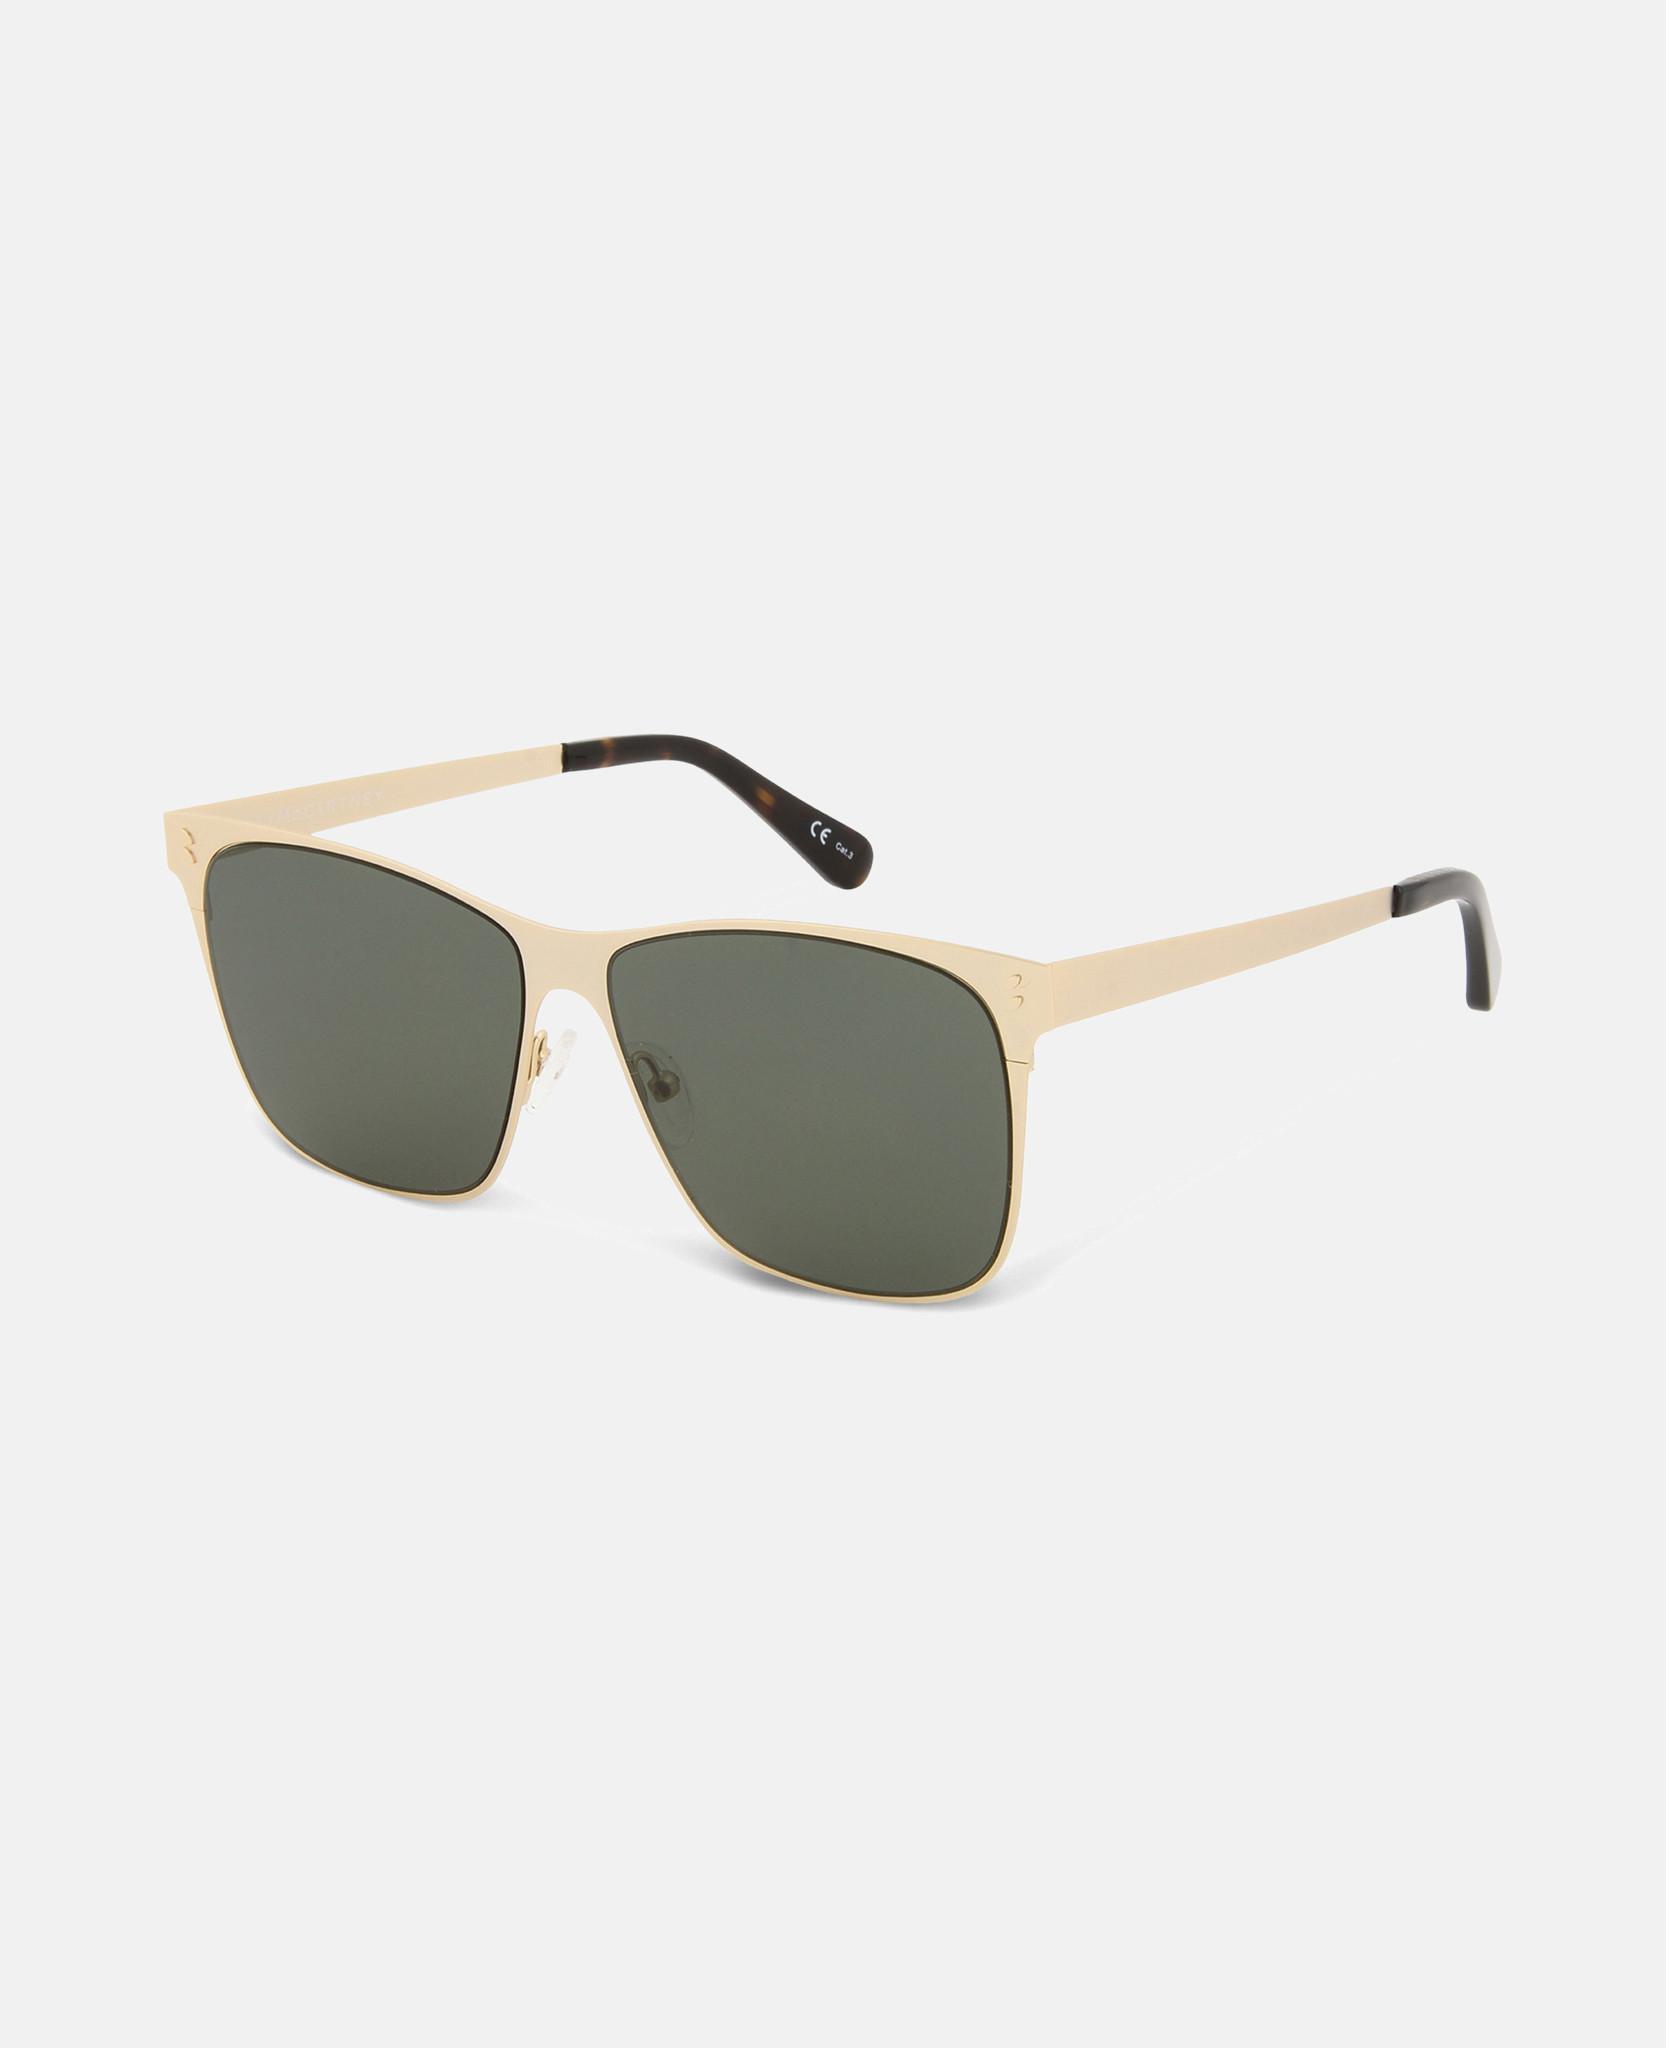 1a14dbe132 Stella McCartney. Women s Gold Square Metal Aviator Sunglasses